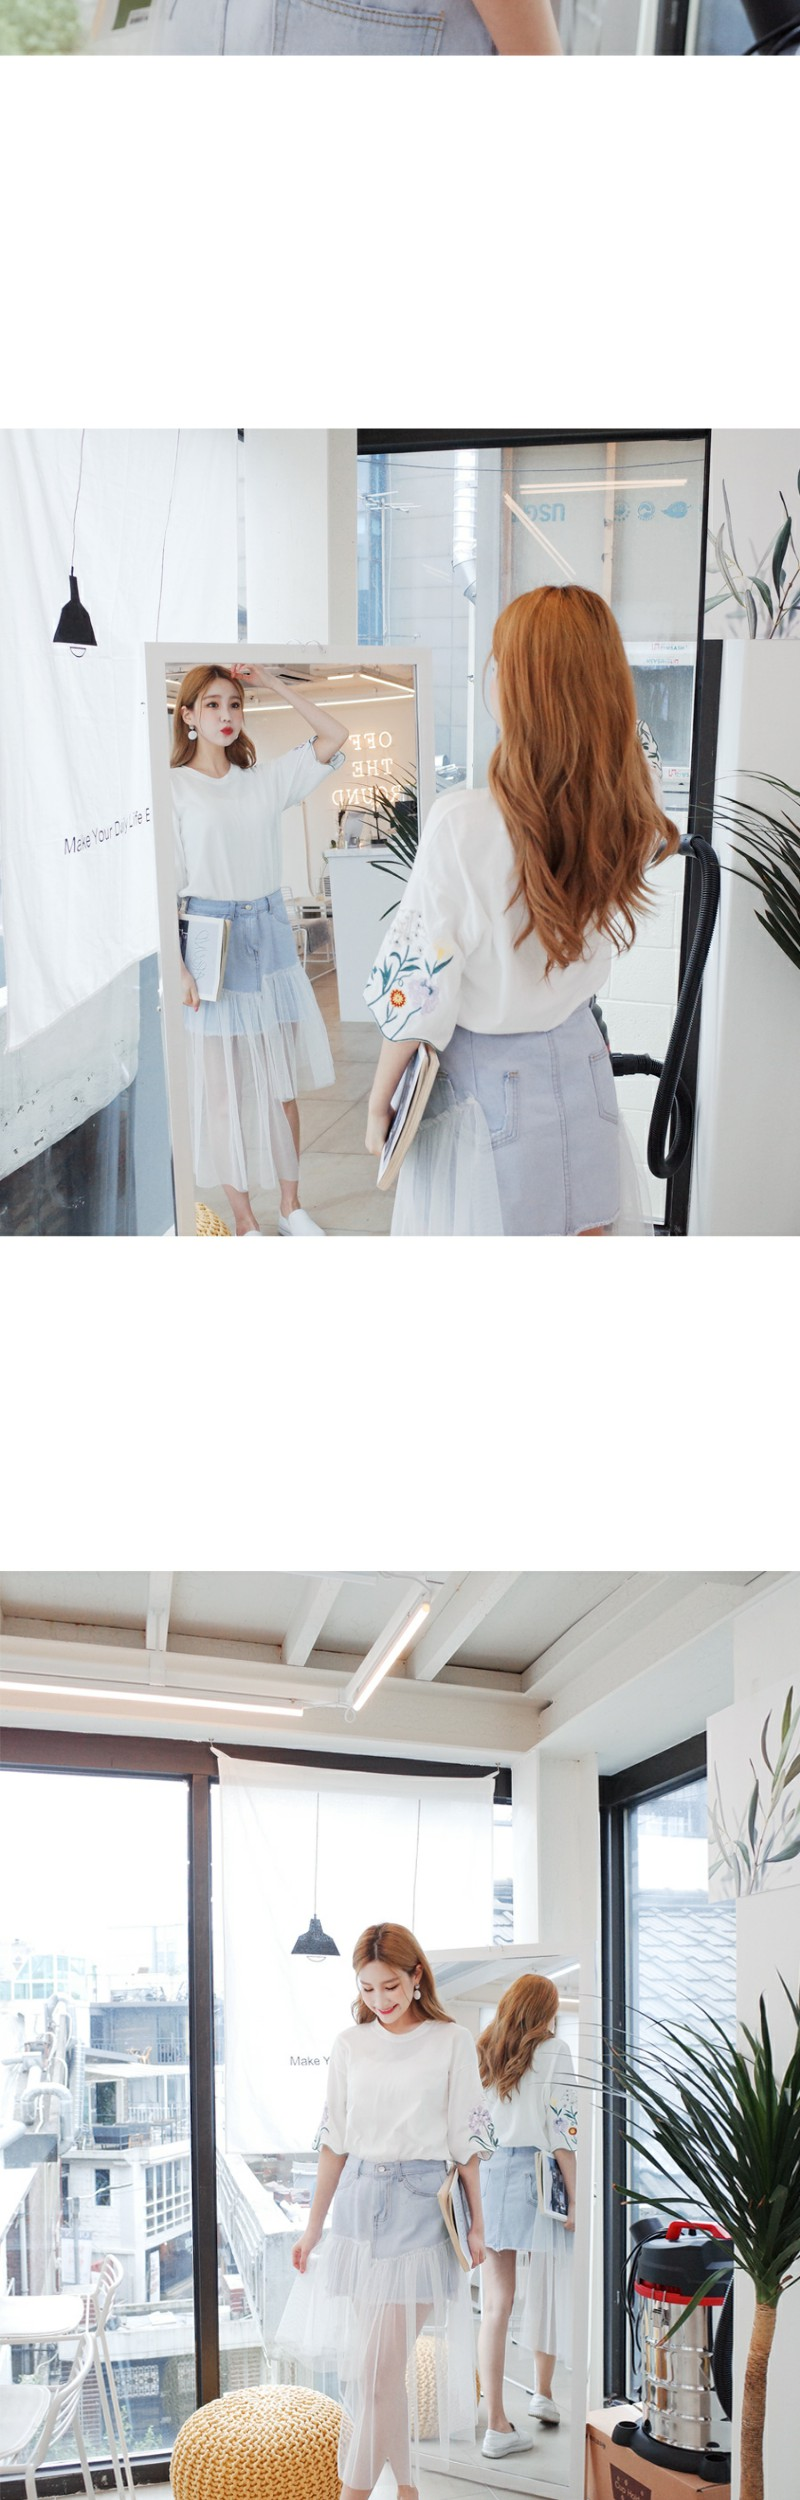 Retail Beautiful embroidery Tee